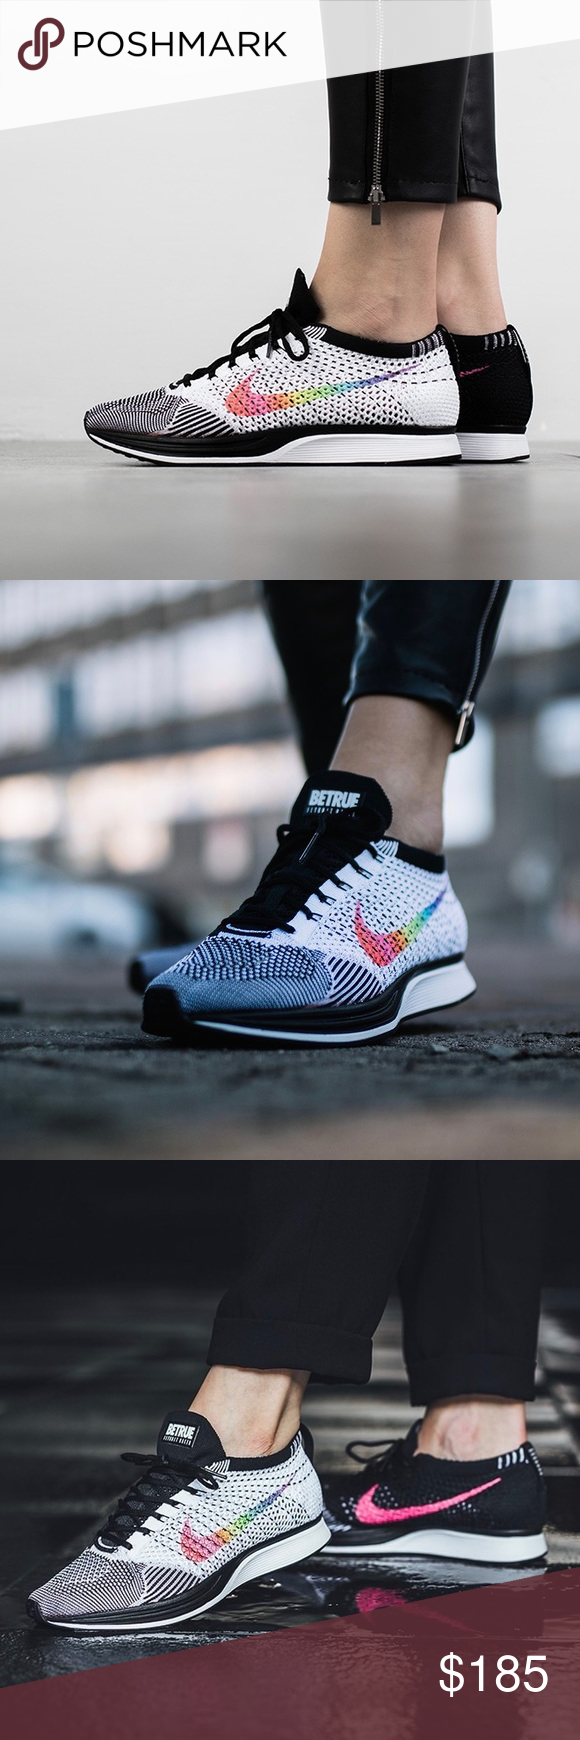 271f9e2917d7 Nike Flyknit Racer Be True Men s Authletic Running Shoes